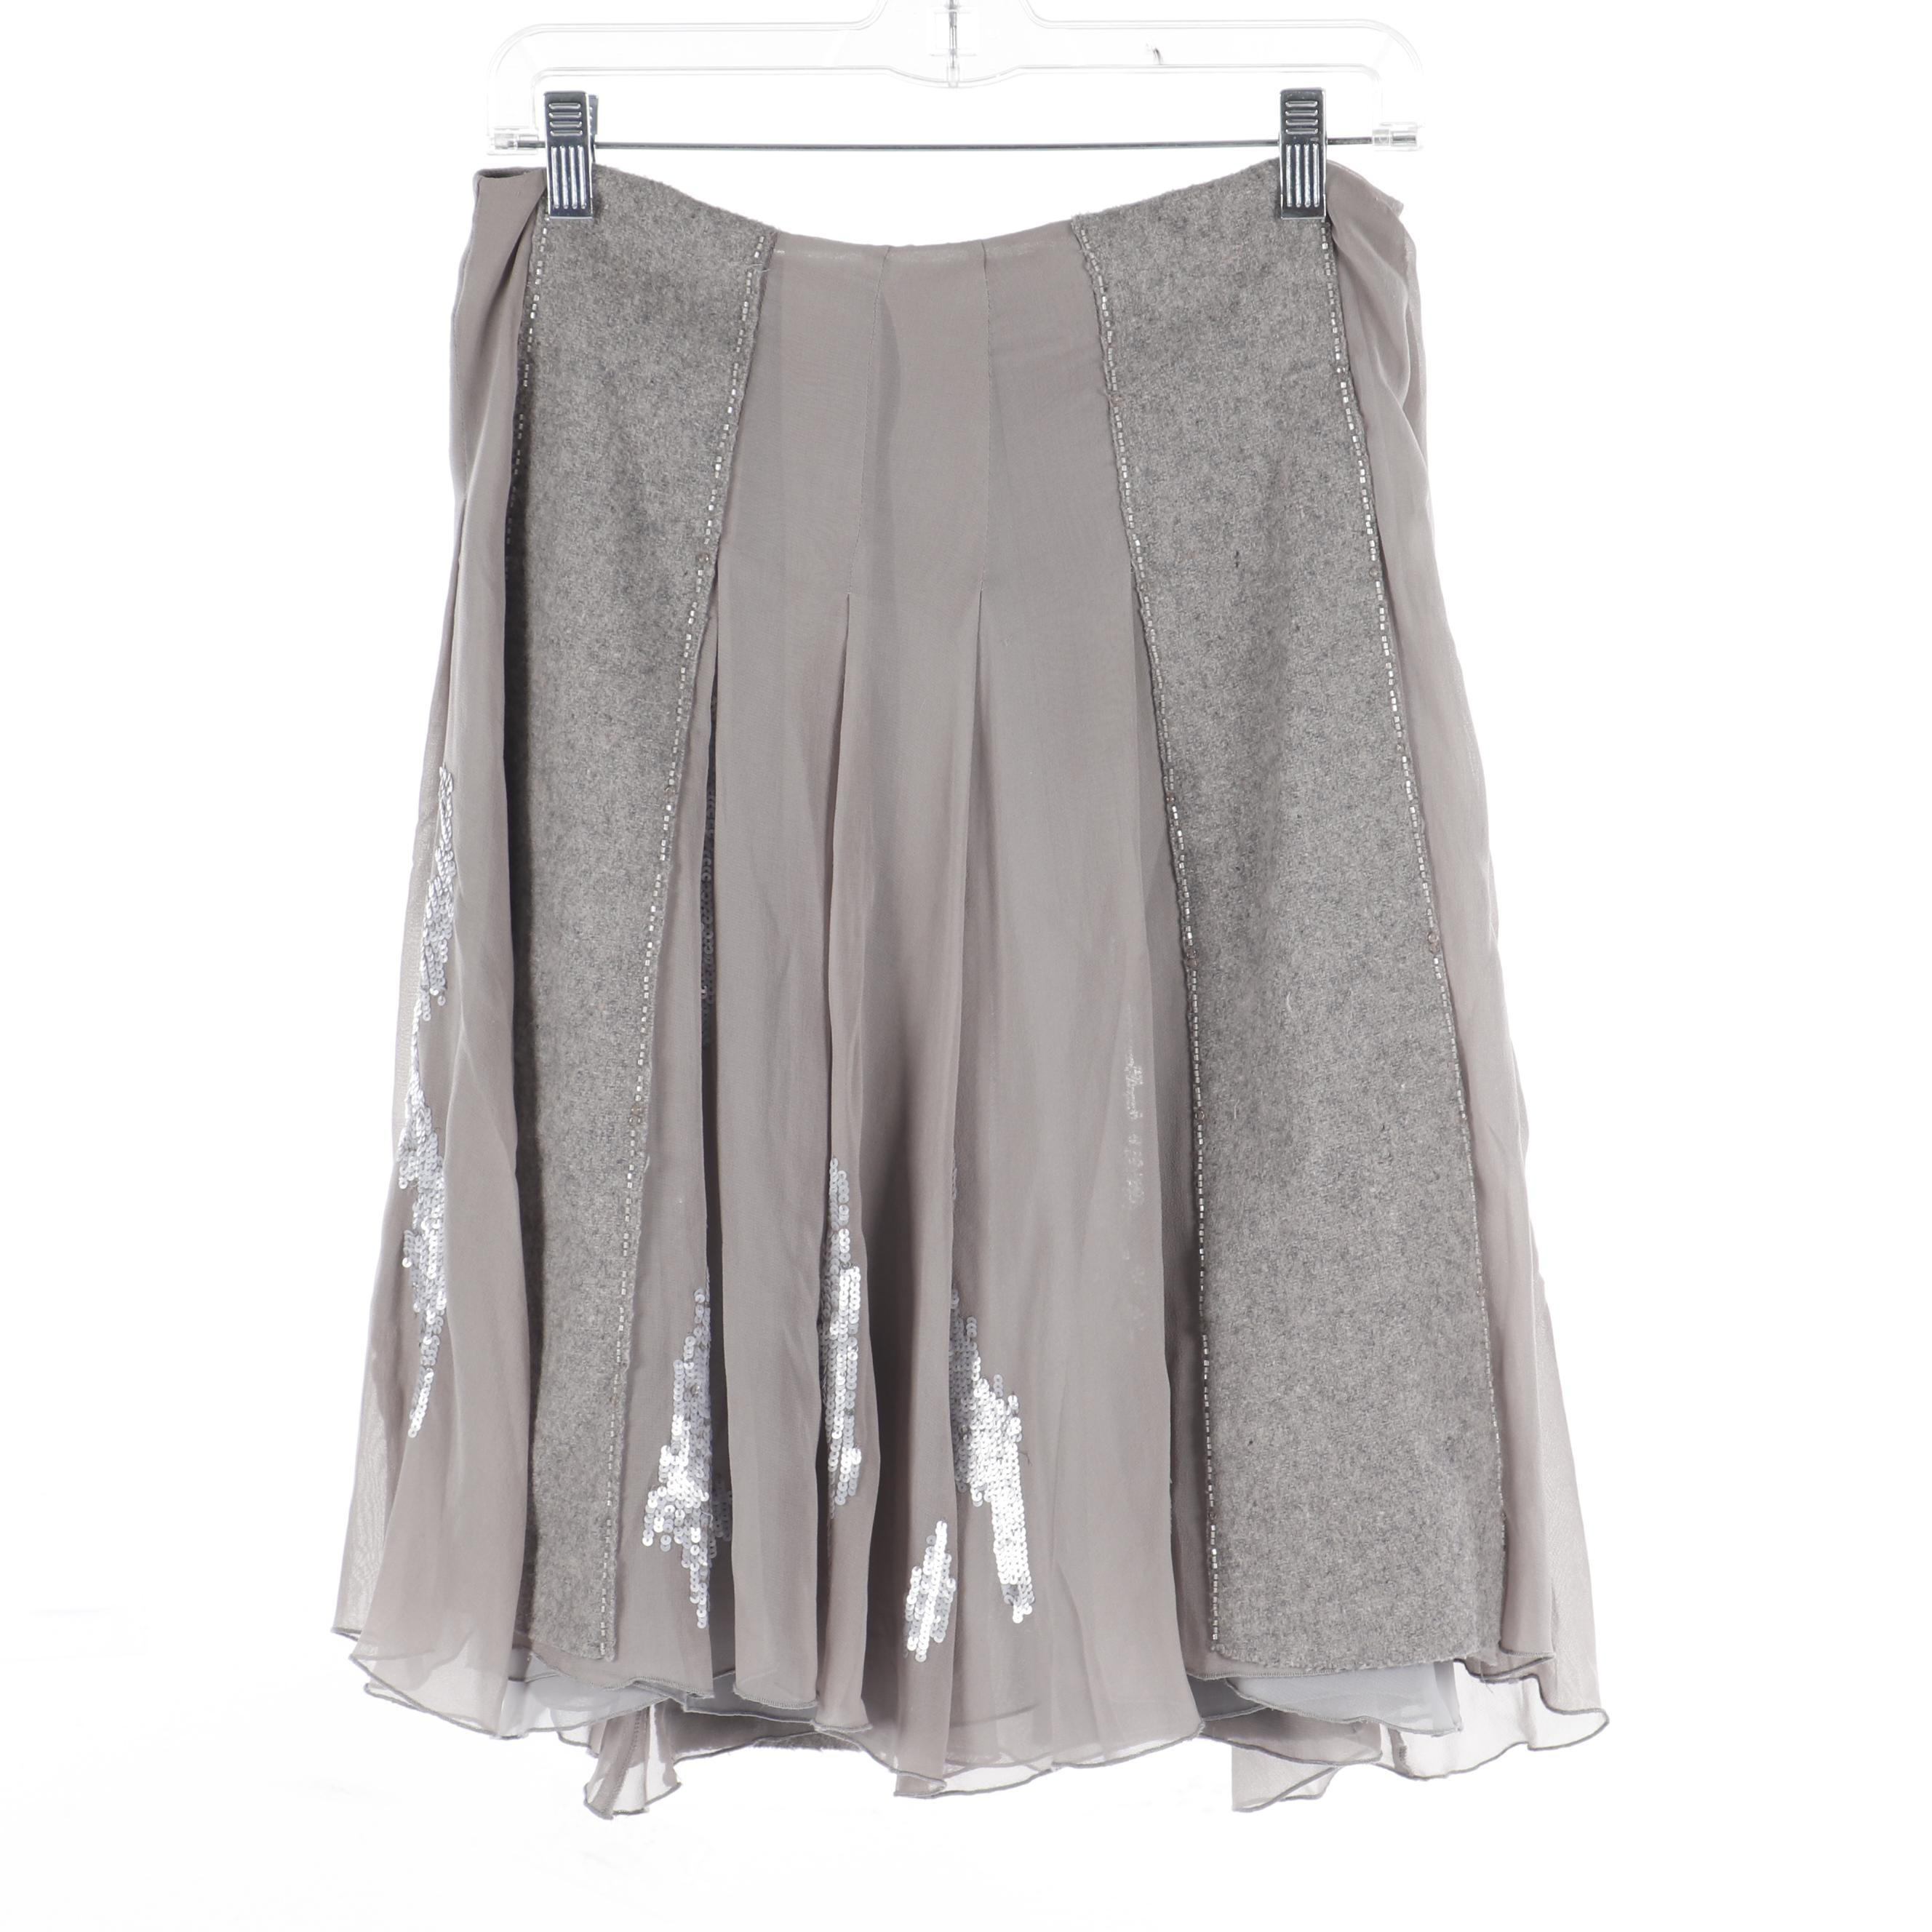 Maurizio Pecoraro Grey Mixed Fabrics Top Stitch Pleated Skirt with Sequins